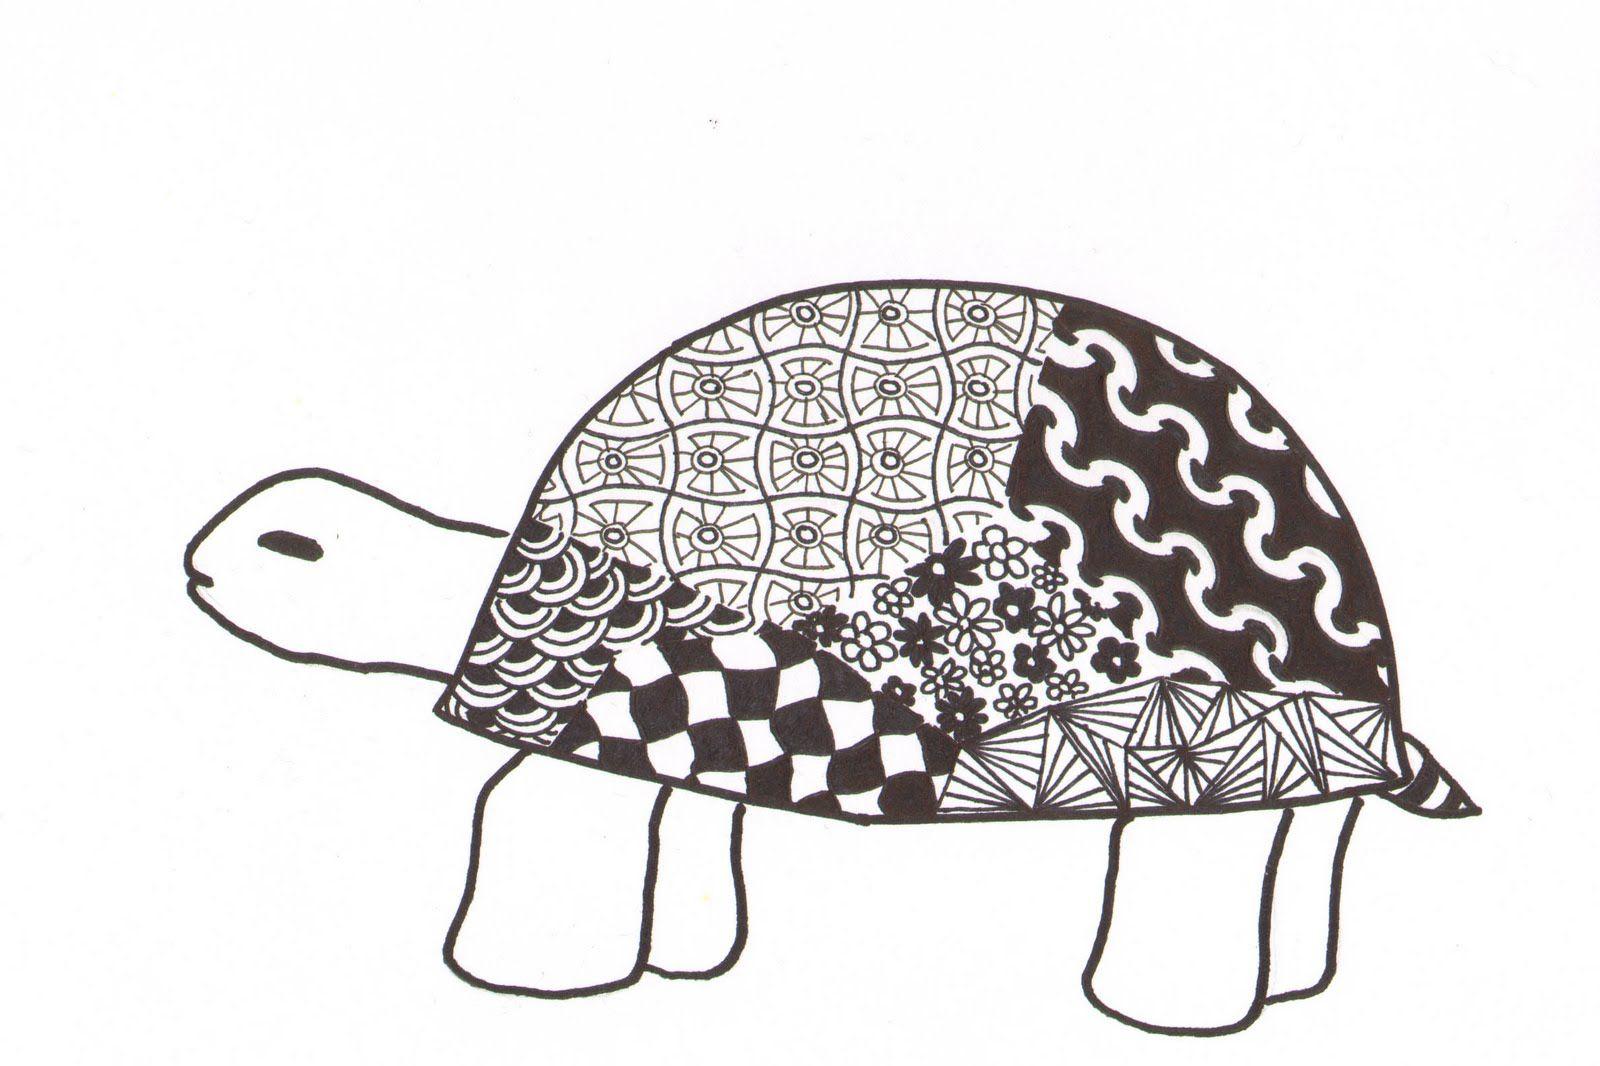 Easy Line Drawings Of Animals : 거북이 평면구성 turtle image pinterest and animal